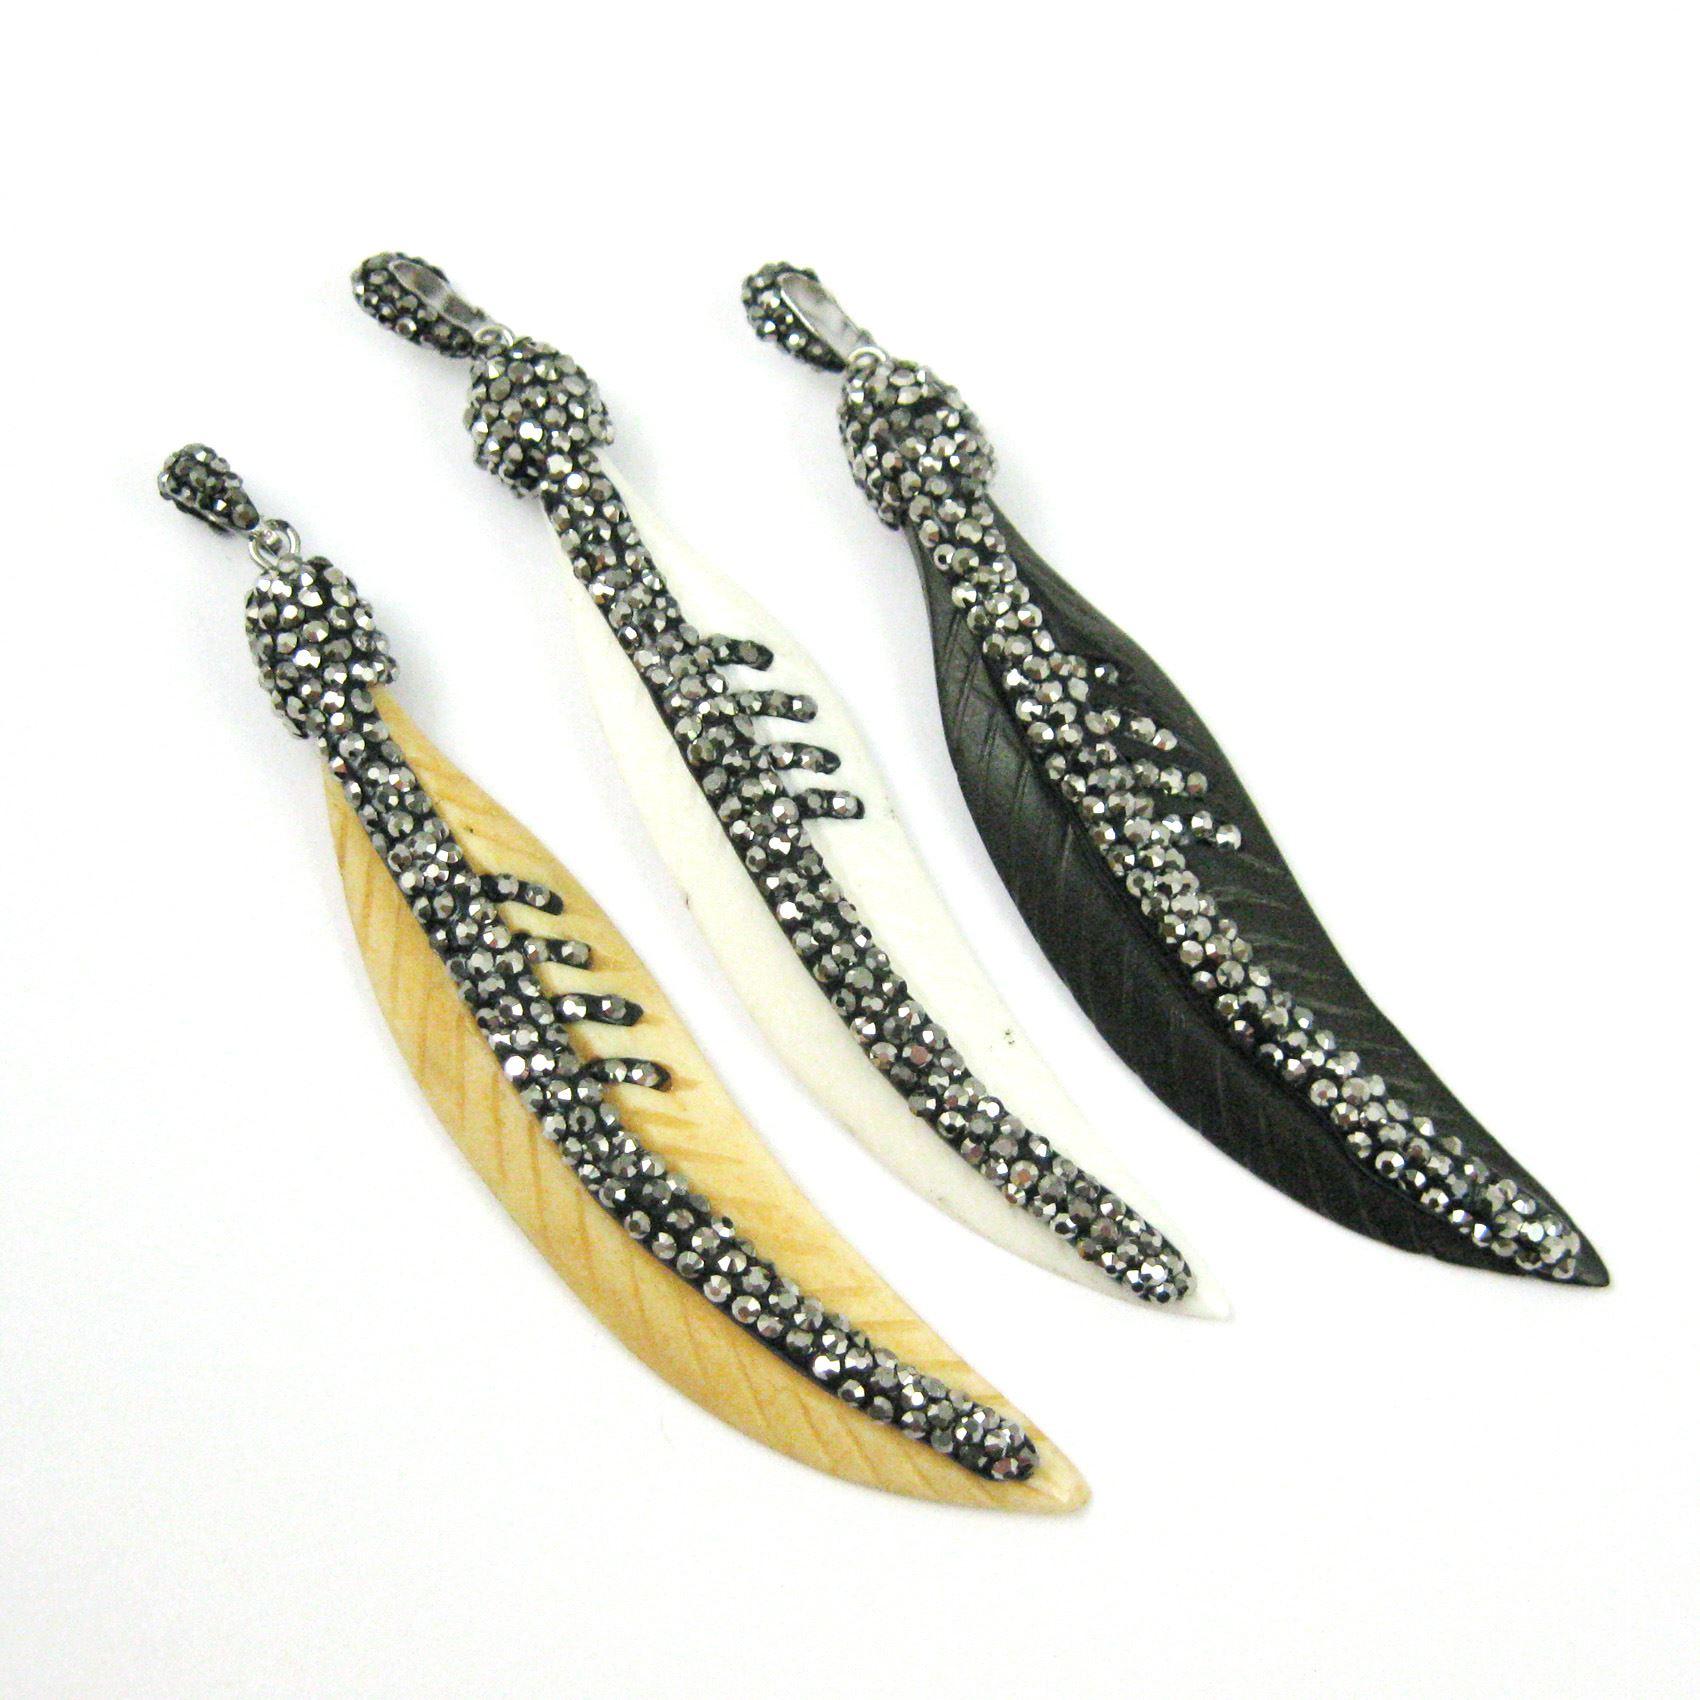 Genuine Buffalo Bone Leaf, Zircon Pave Embellished Long Textured Feather Pendant,Boho Pave Pendant, Genuine Bone Pendant- Mustard - Small- 66mm